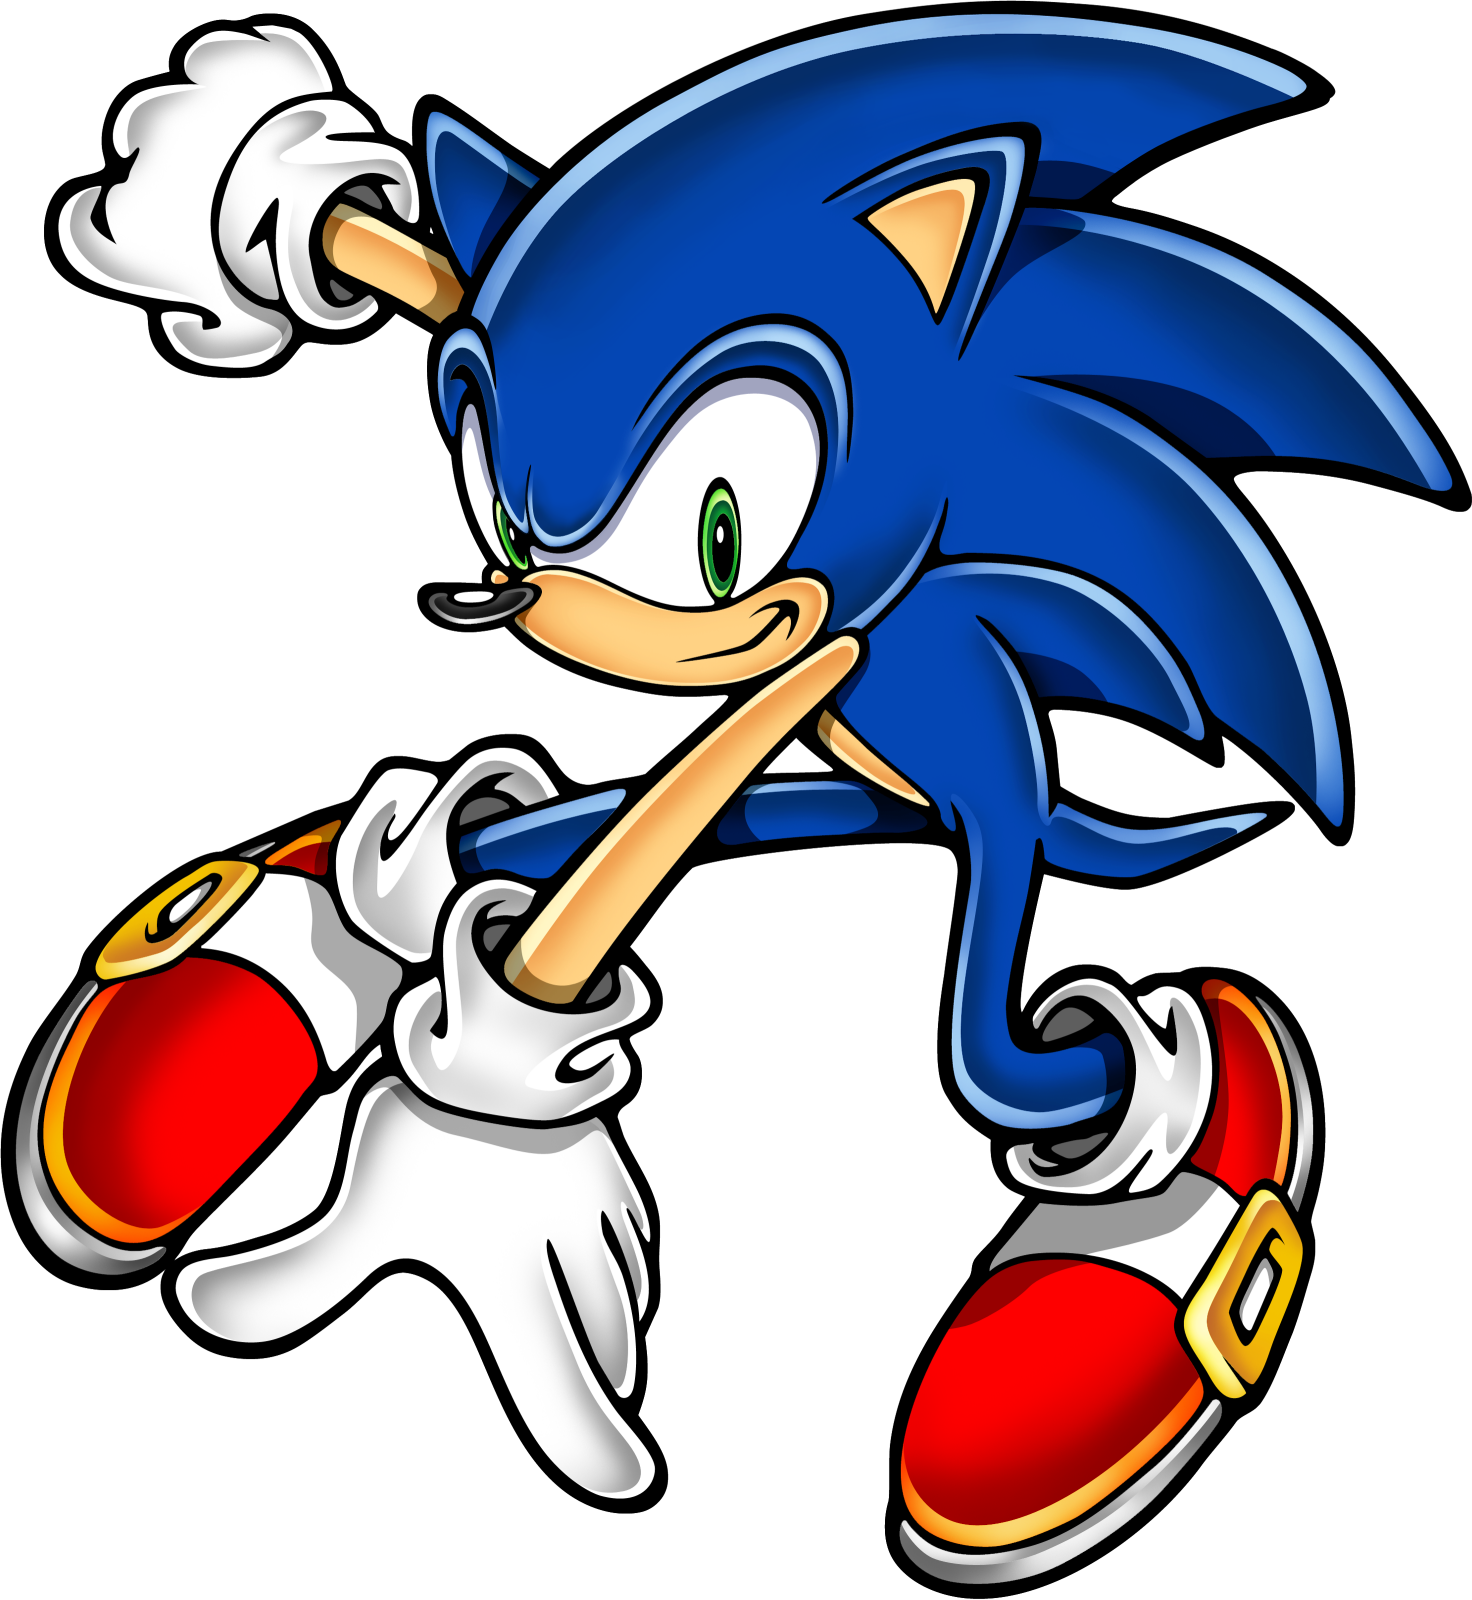 Sonic Art Assets DVD - Sonic The Hedgeho-Sonic Art Assets DVD - Sonic The Hedgehog - 21.png-5